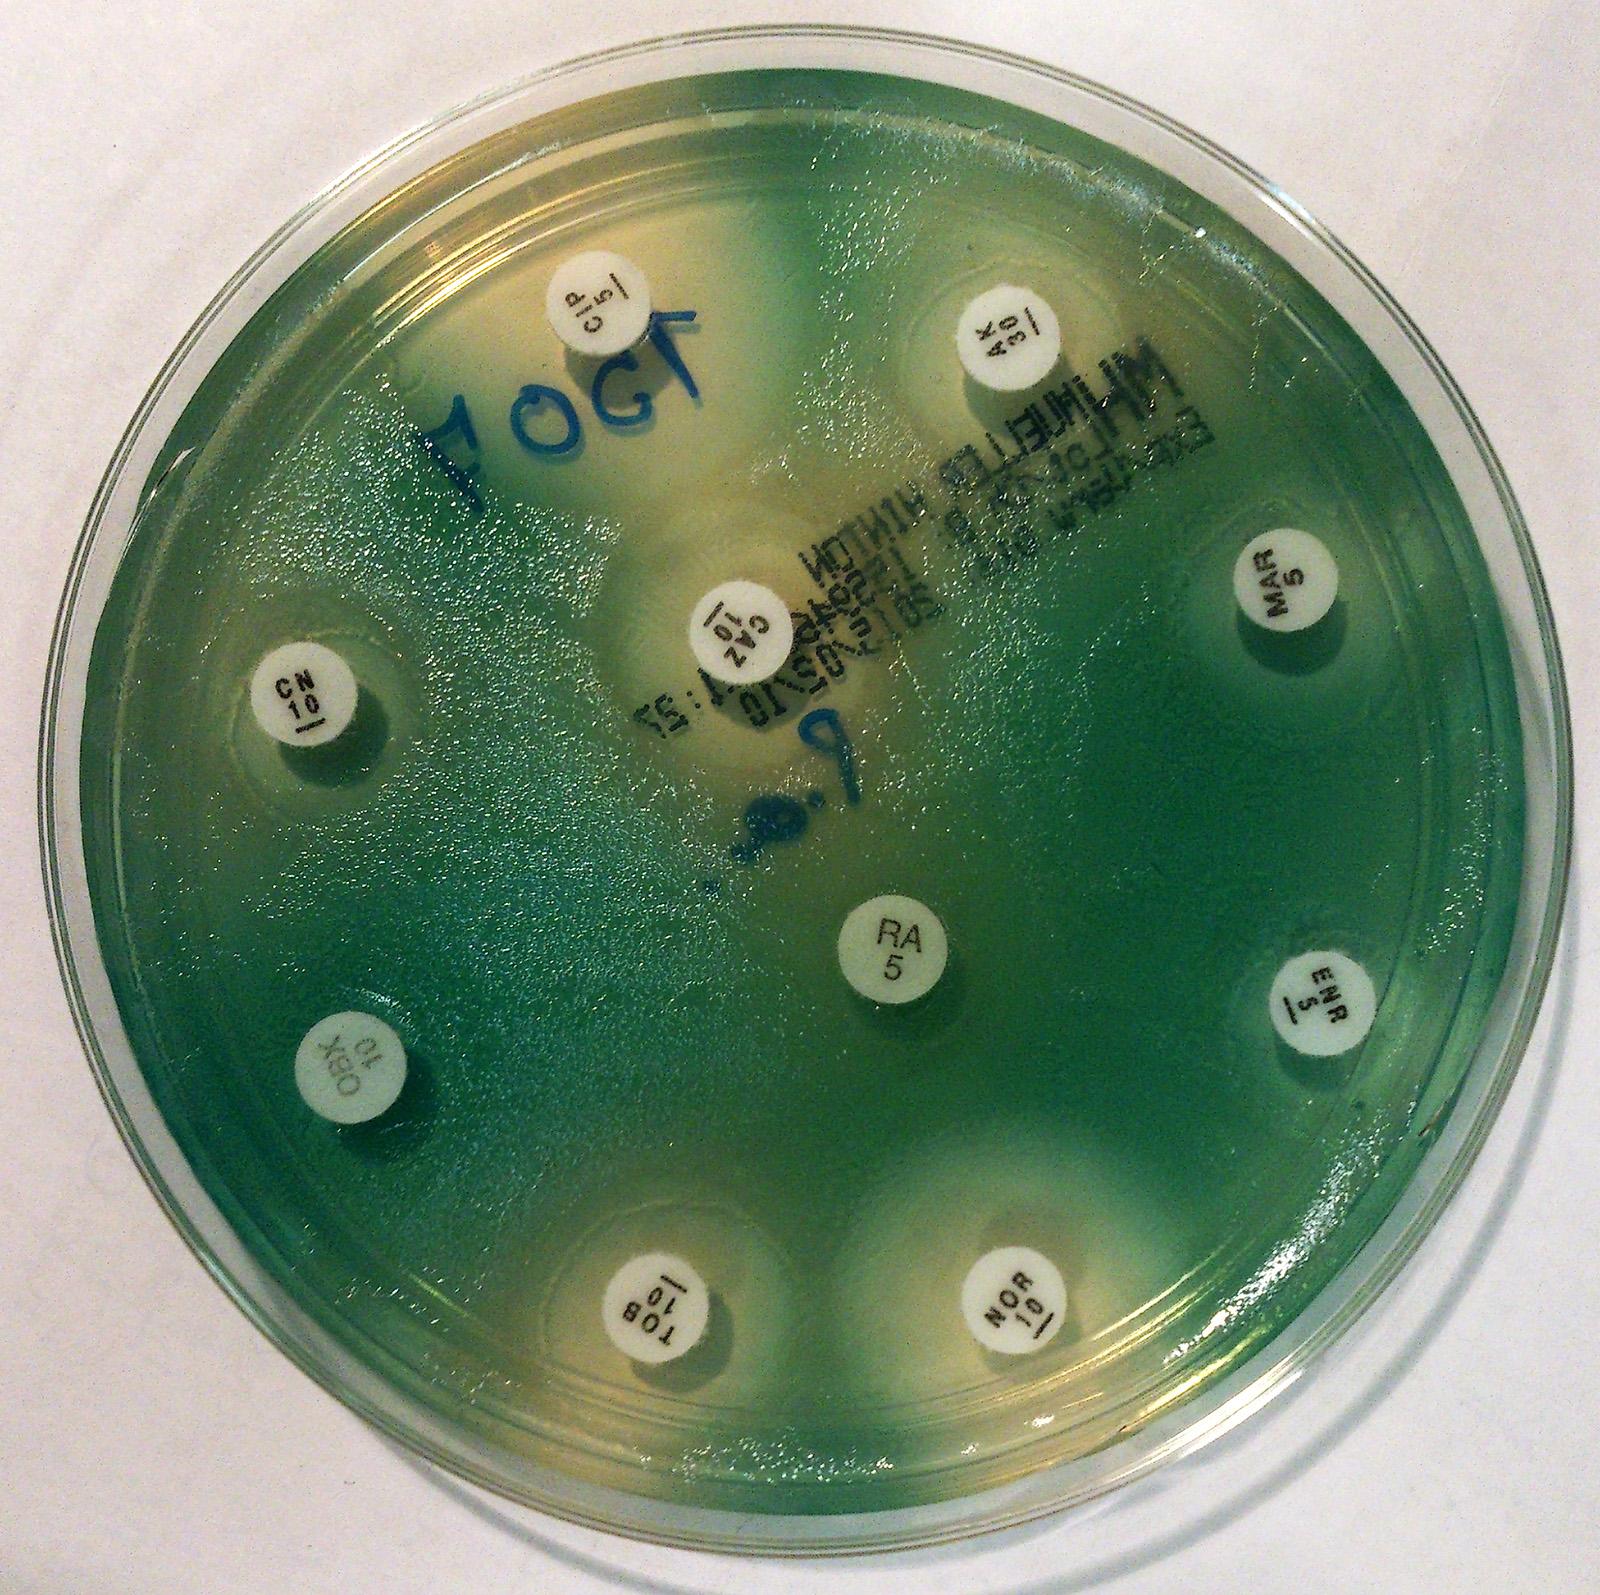 Petasites comp wala dosierung ciprofloxacin